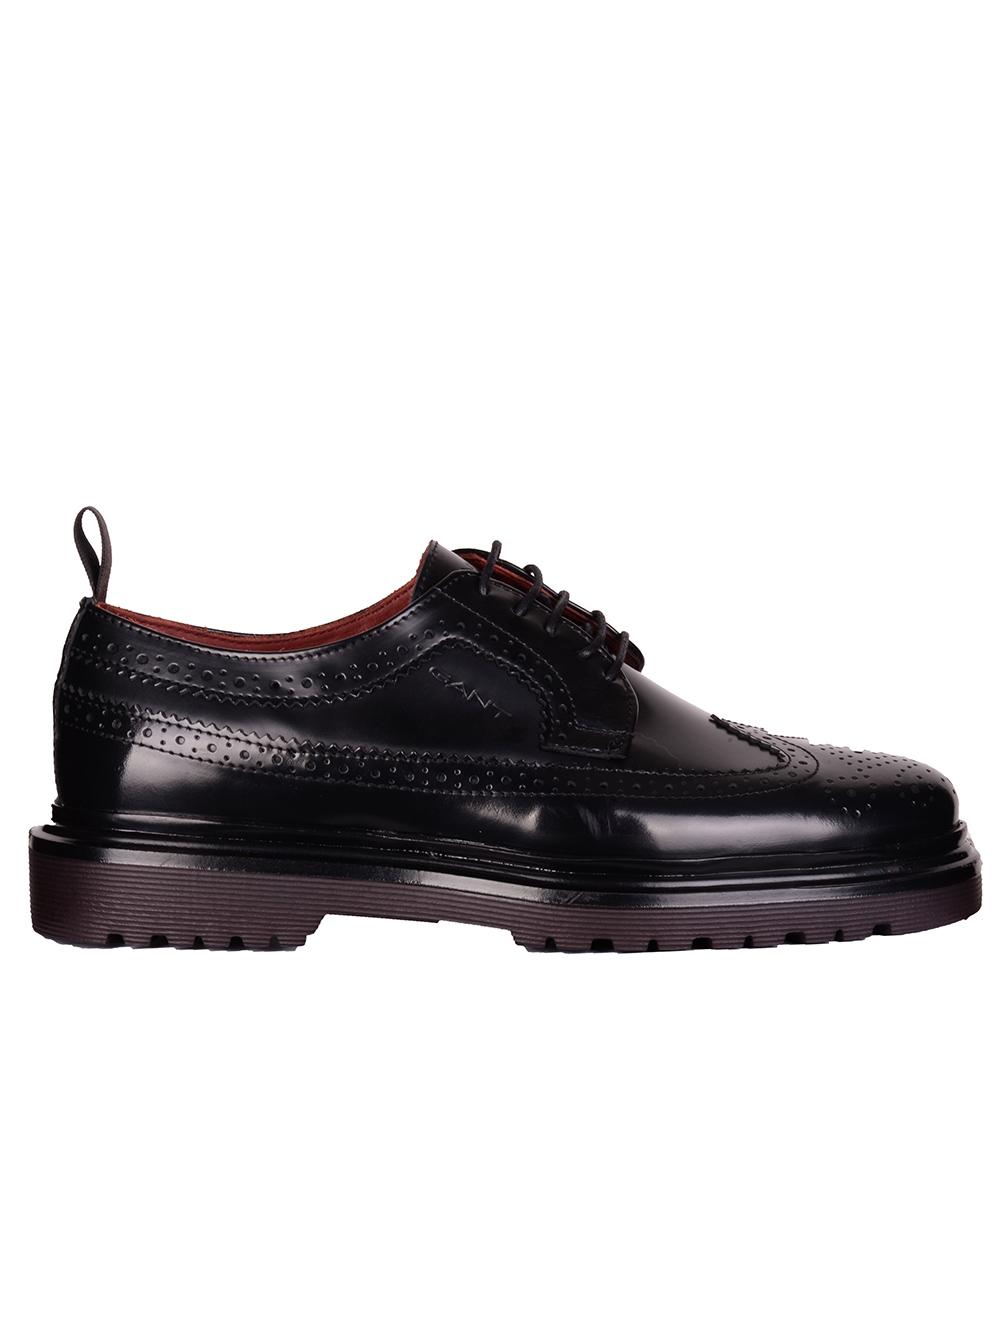 GANT Παπούτσια oxford 3GS21631003-00 ΜΑΥΡΟ